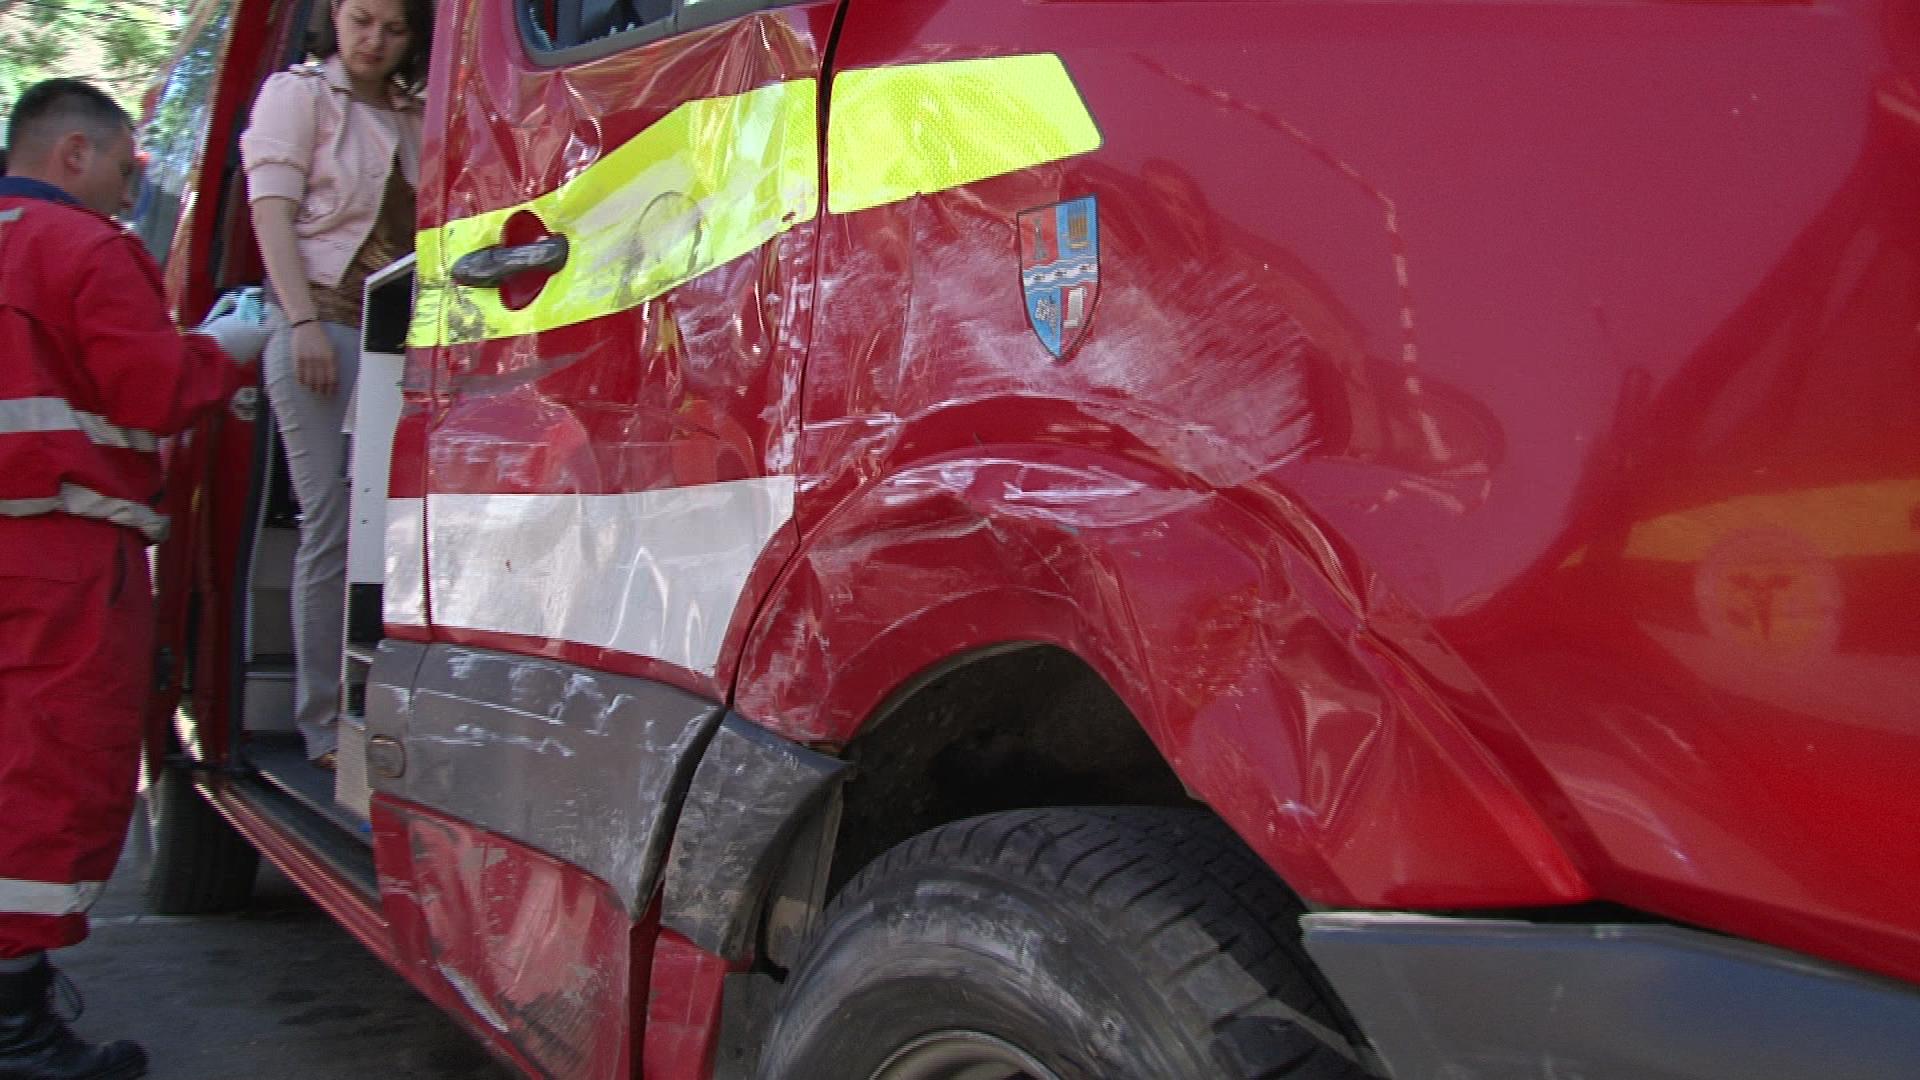 Patru persoane au fost ranite in urma unui accident dintre o masina si o ambulanta SMURD, la Oradea